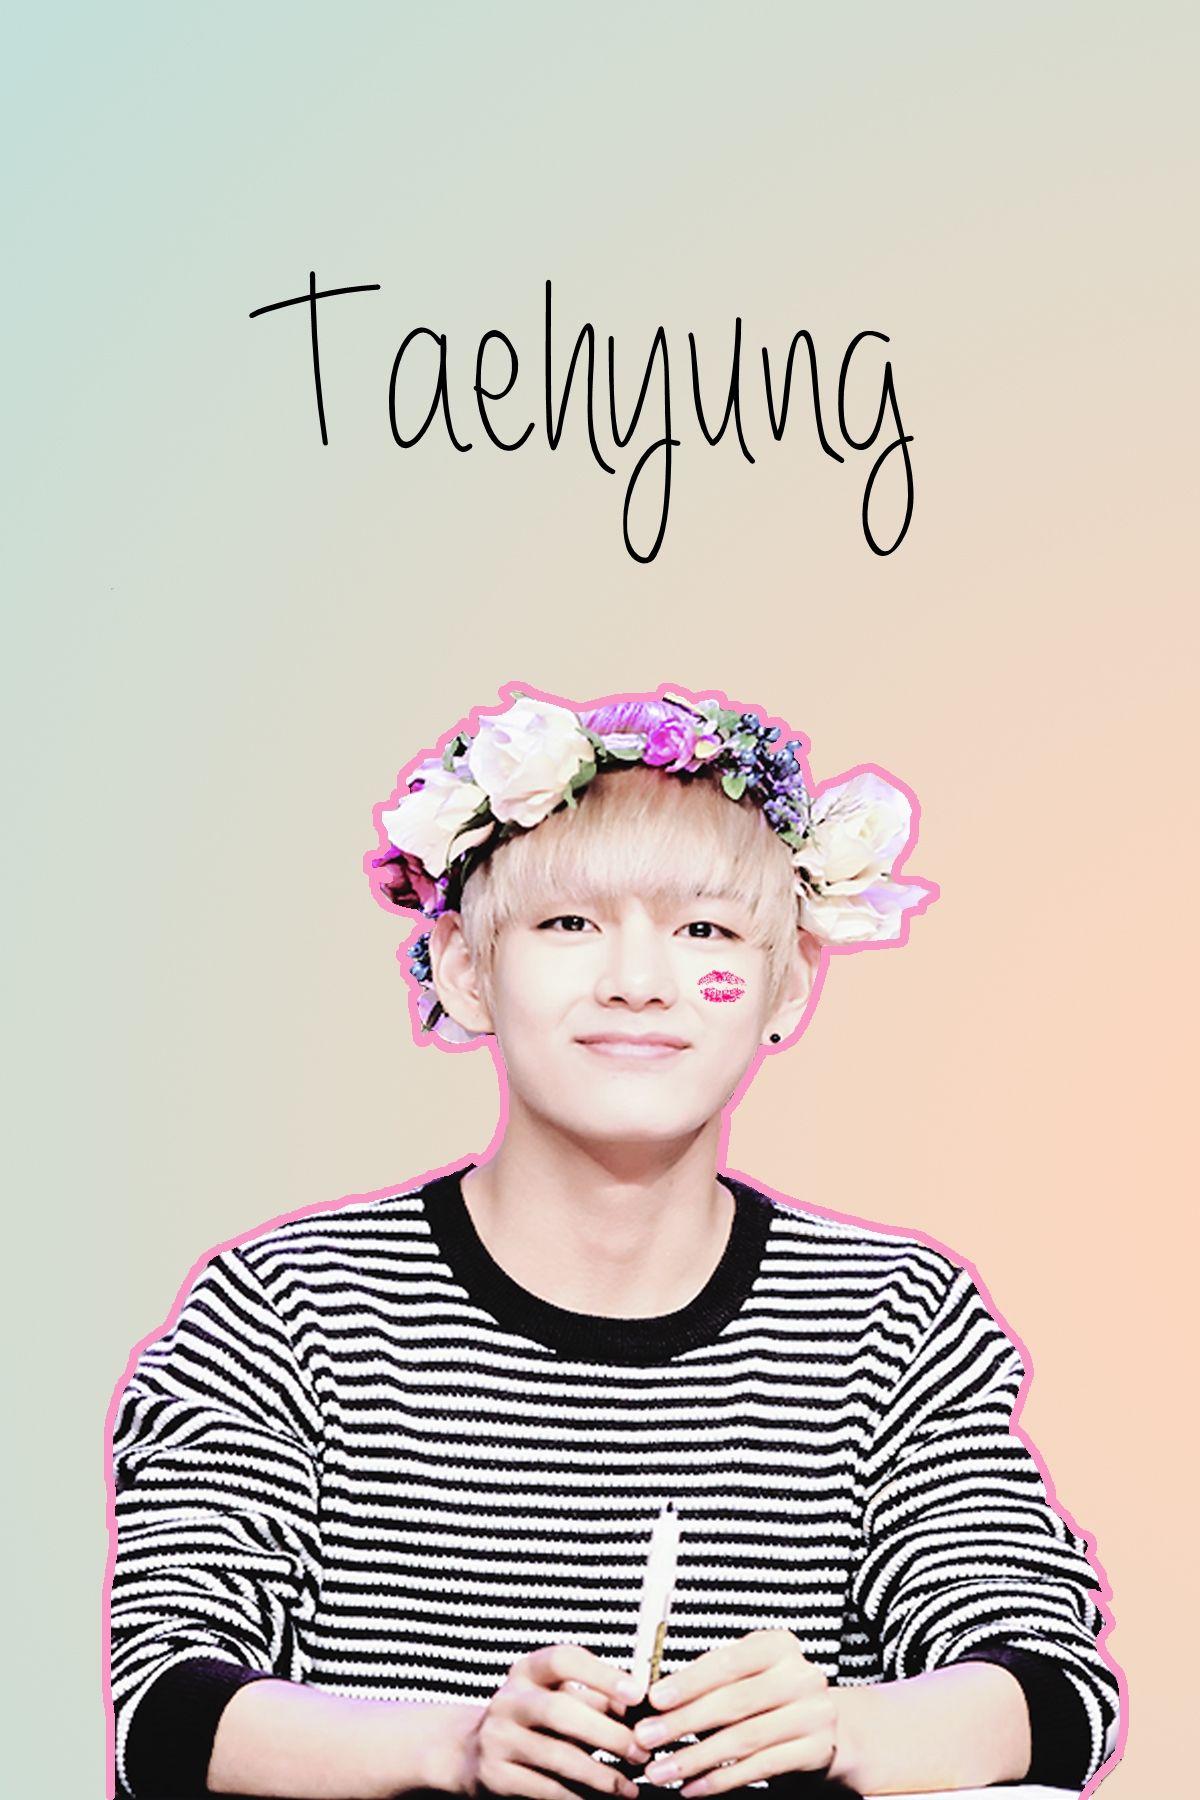 Wallpaper V Taehyung Bts Bts Bts Bts Wallpaper At Bts Taehyung